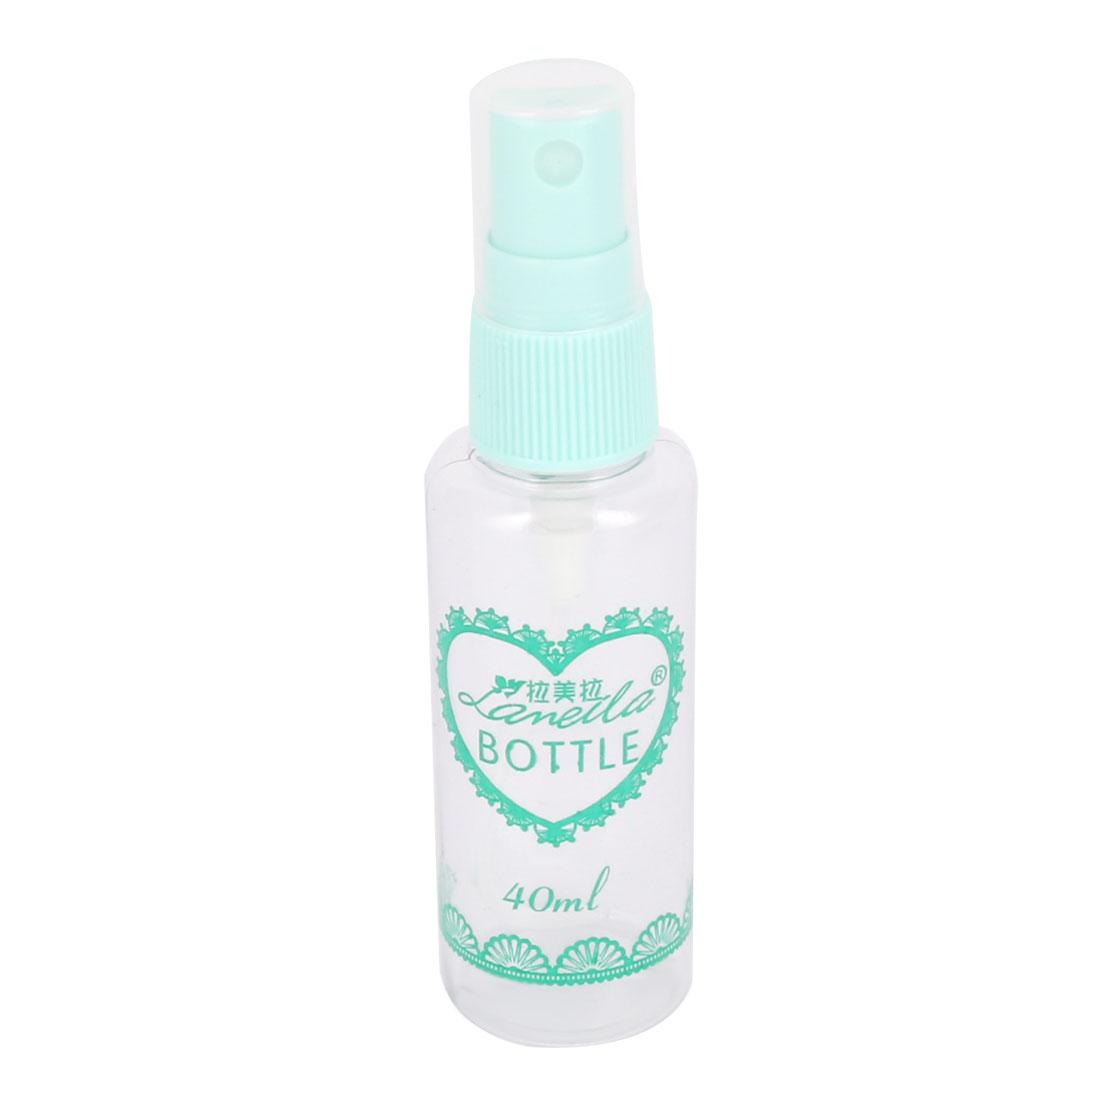 40ML Reuse Travel Plastic Mini Cosmetic Perfume Mist Spray Bottle Baby Blue